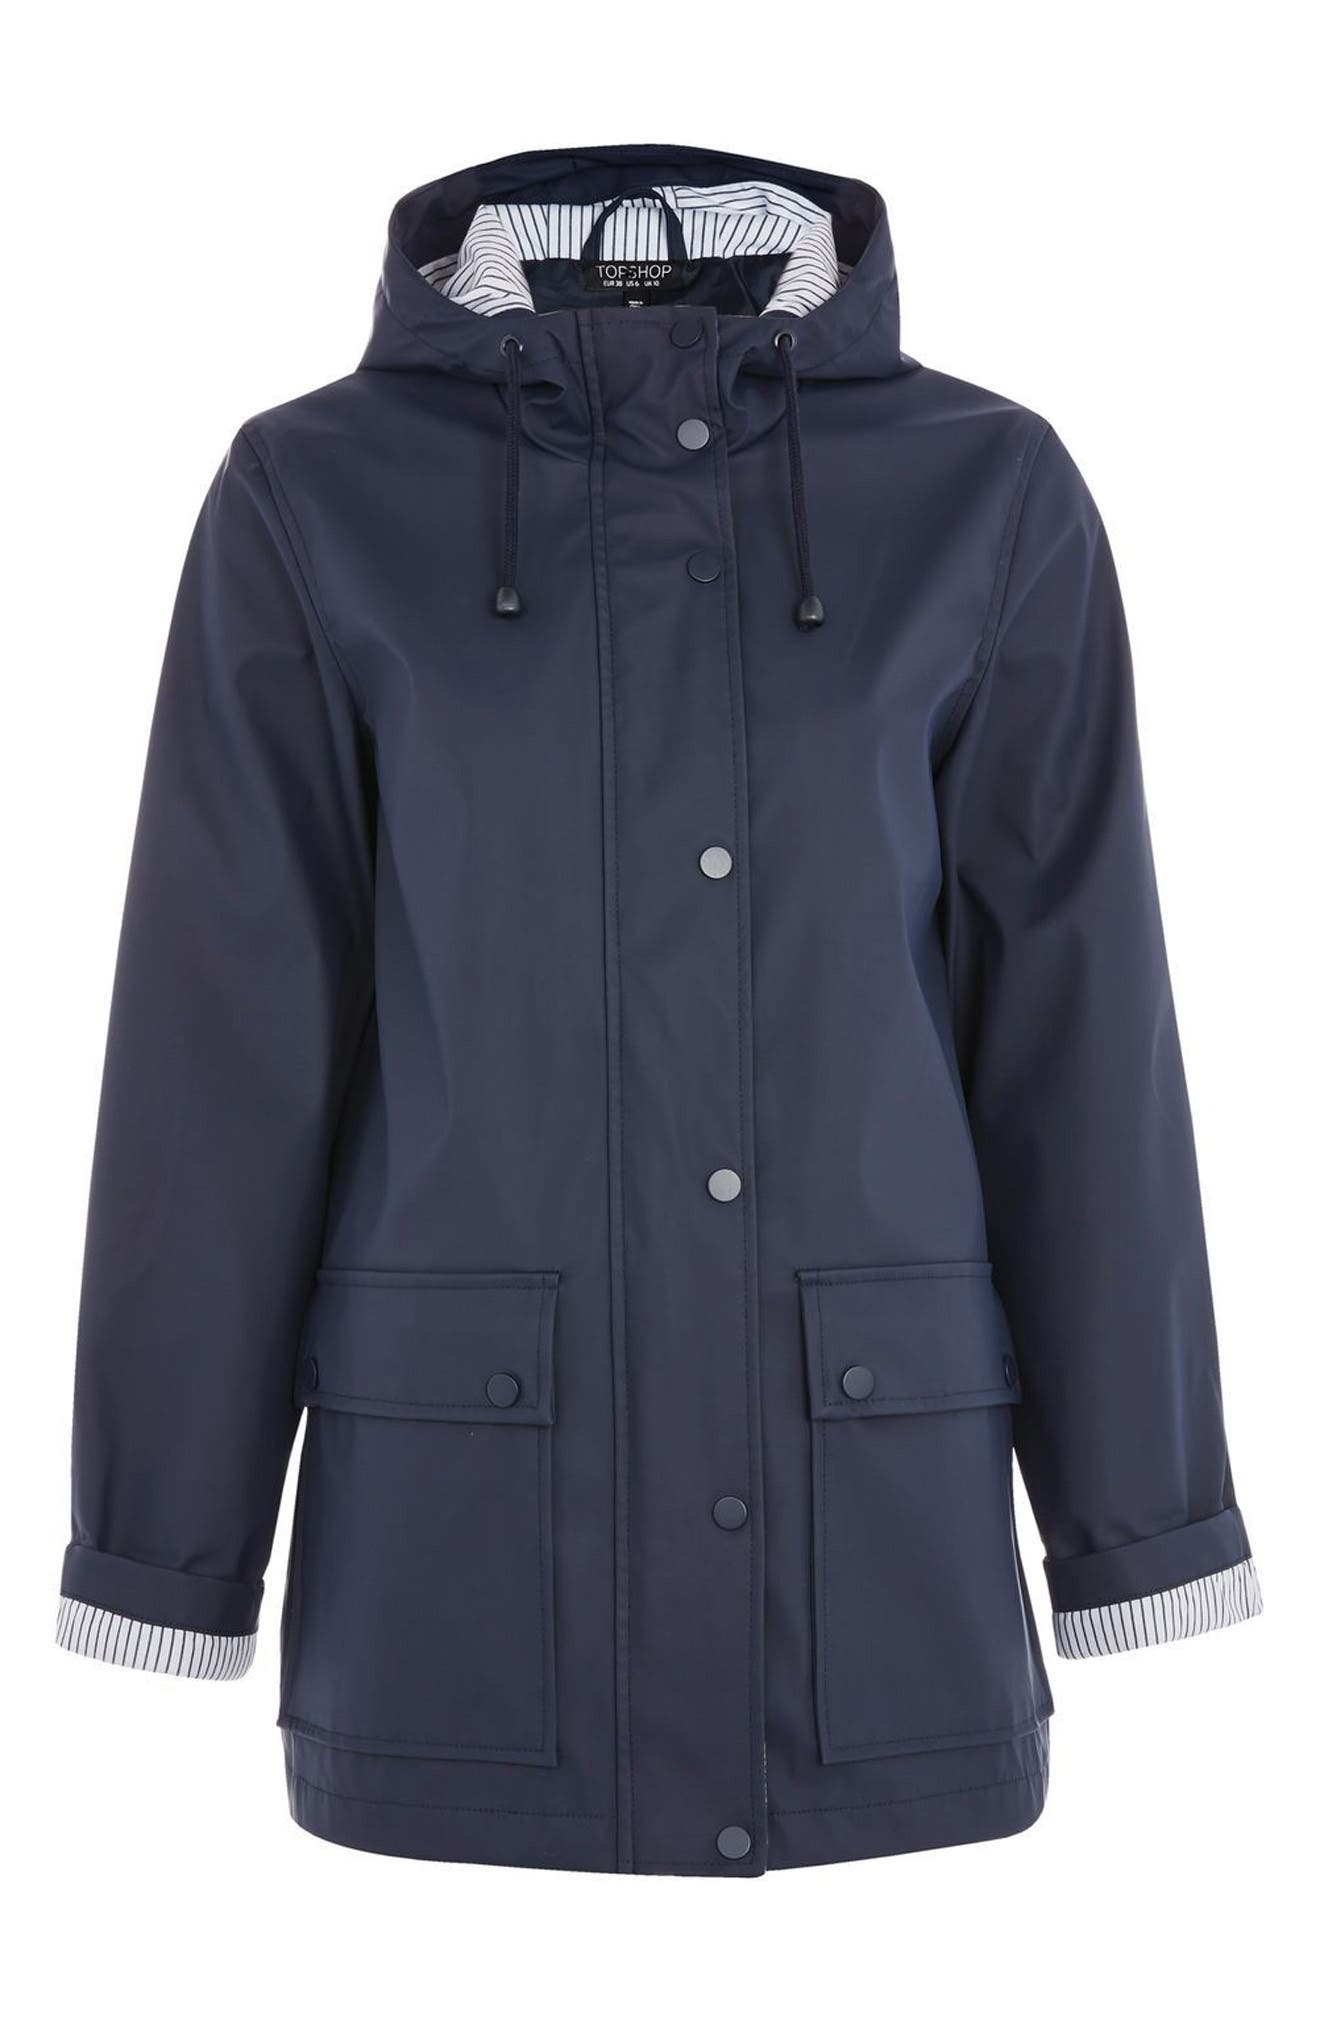 Maisie Rain Jacket,                             Alternate thumbnail 4, color,                             Navy Blue